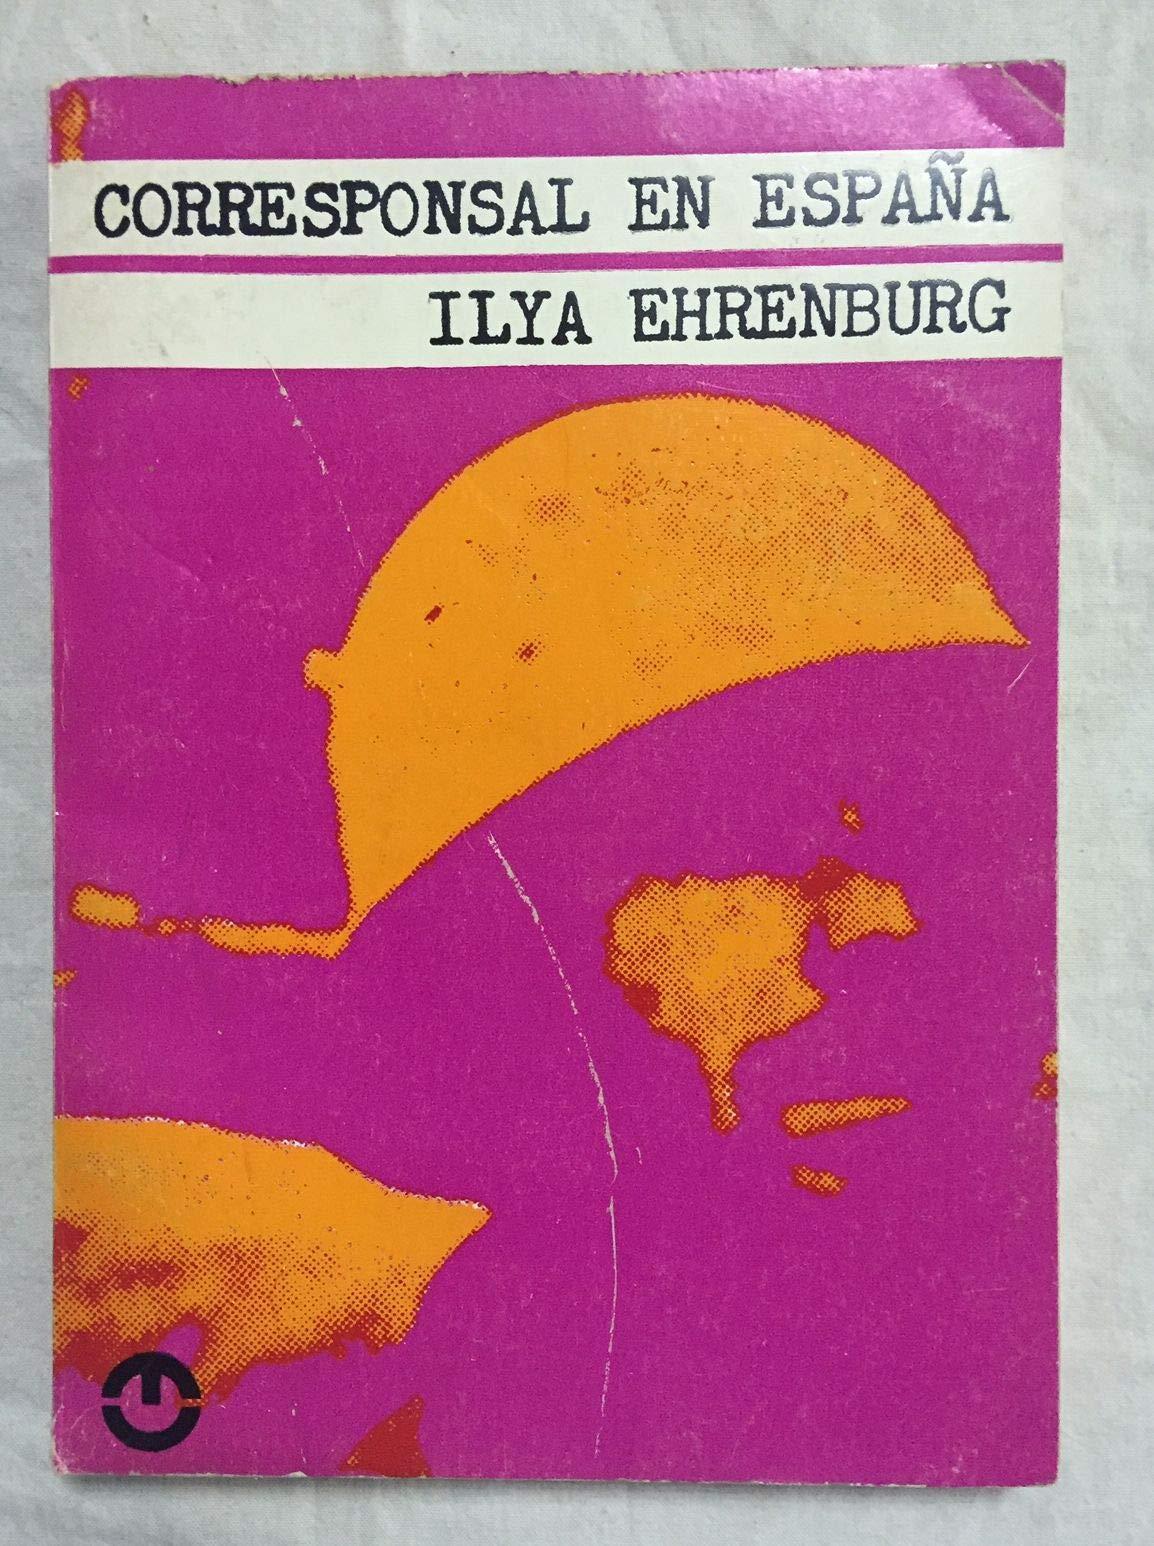 CORRESPONSAL EN ESPAÑA: Amazon.es: EHRENBURG, Illya: Libros